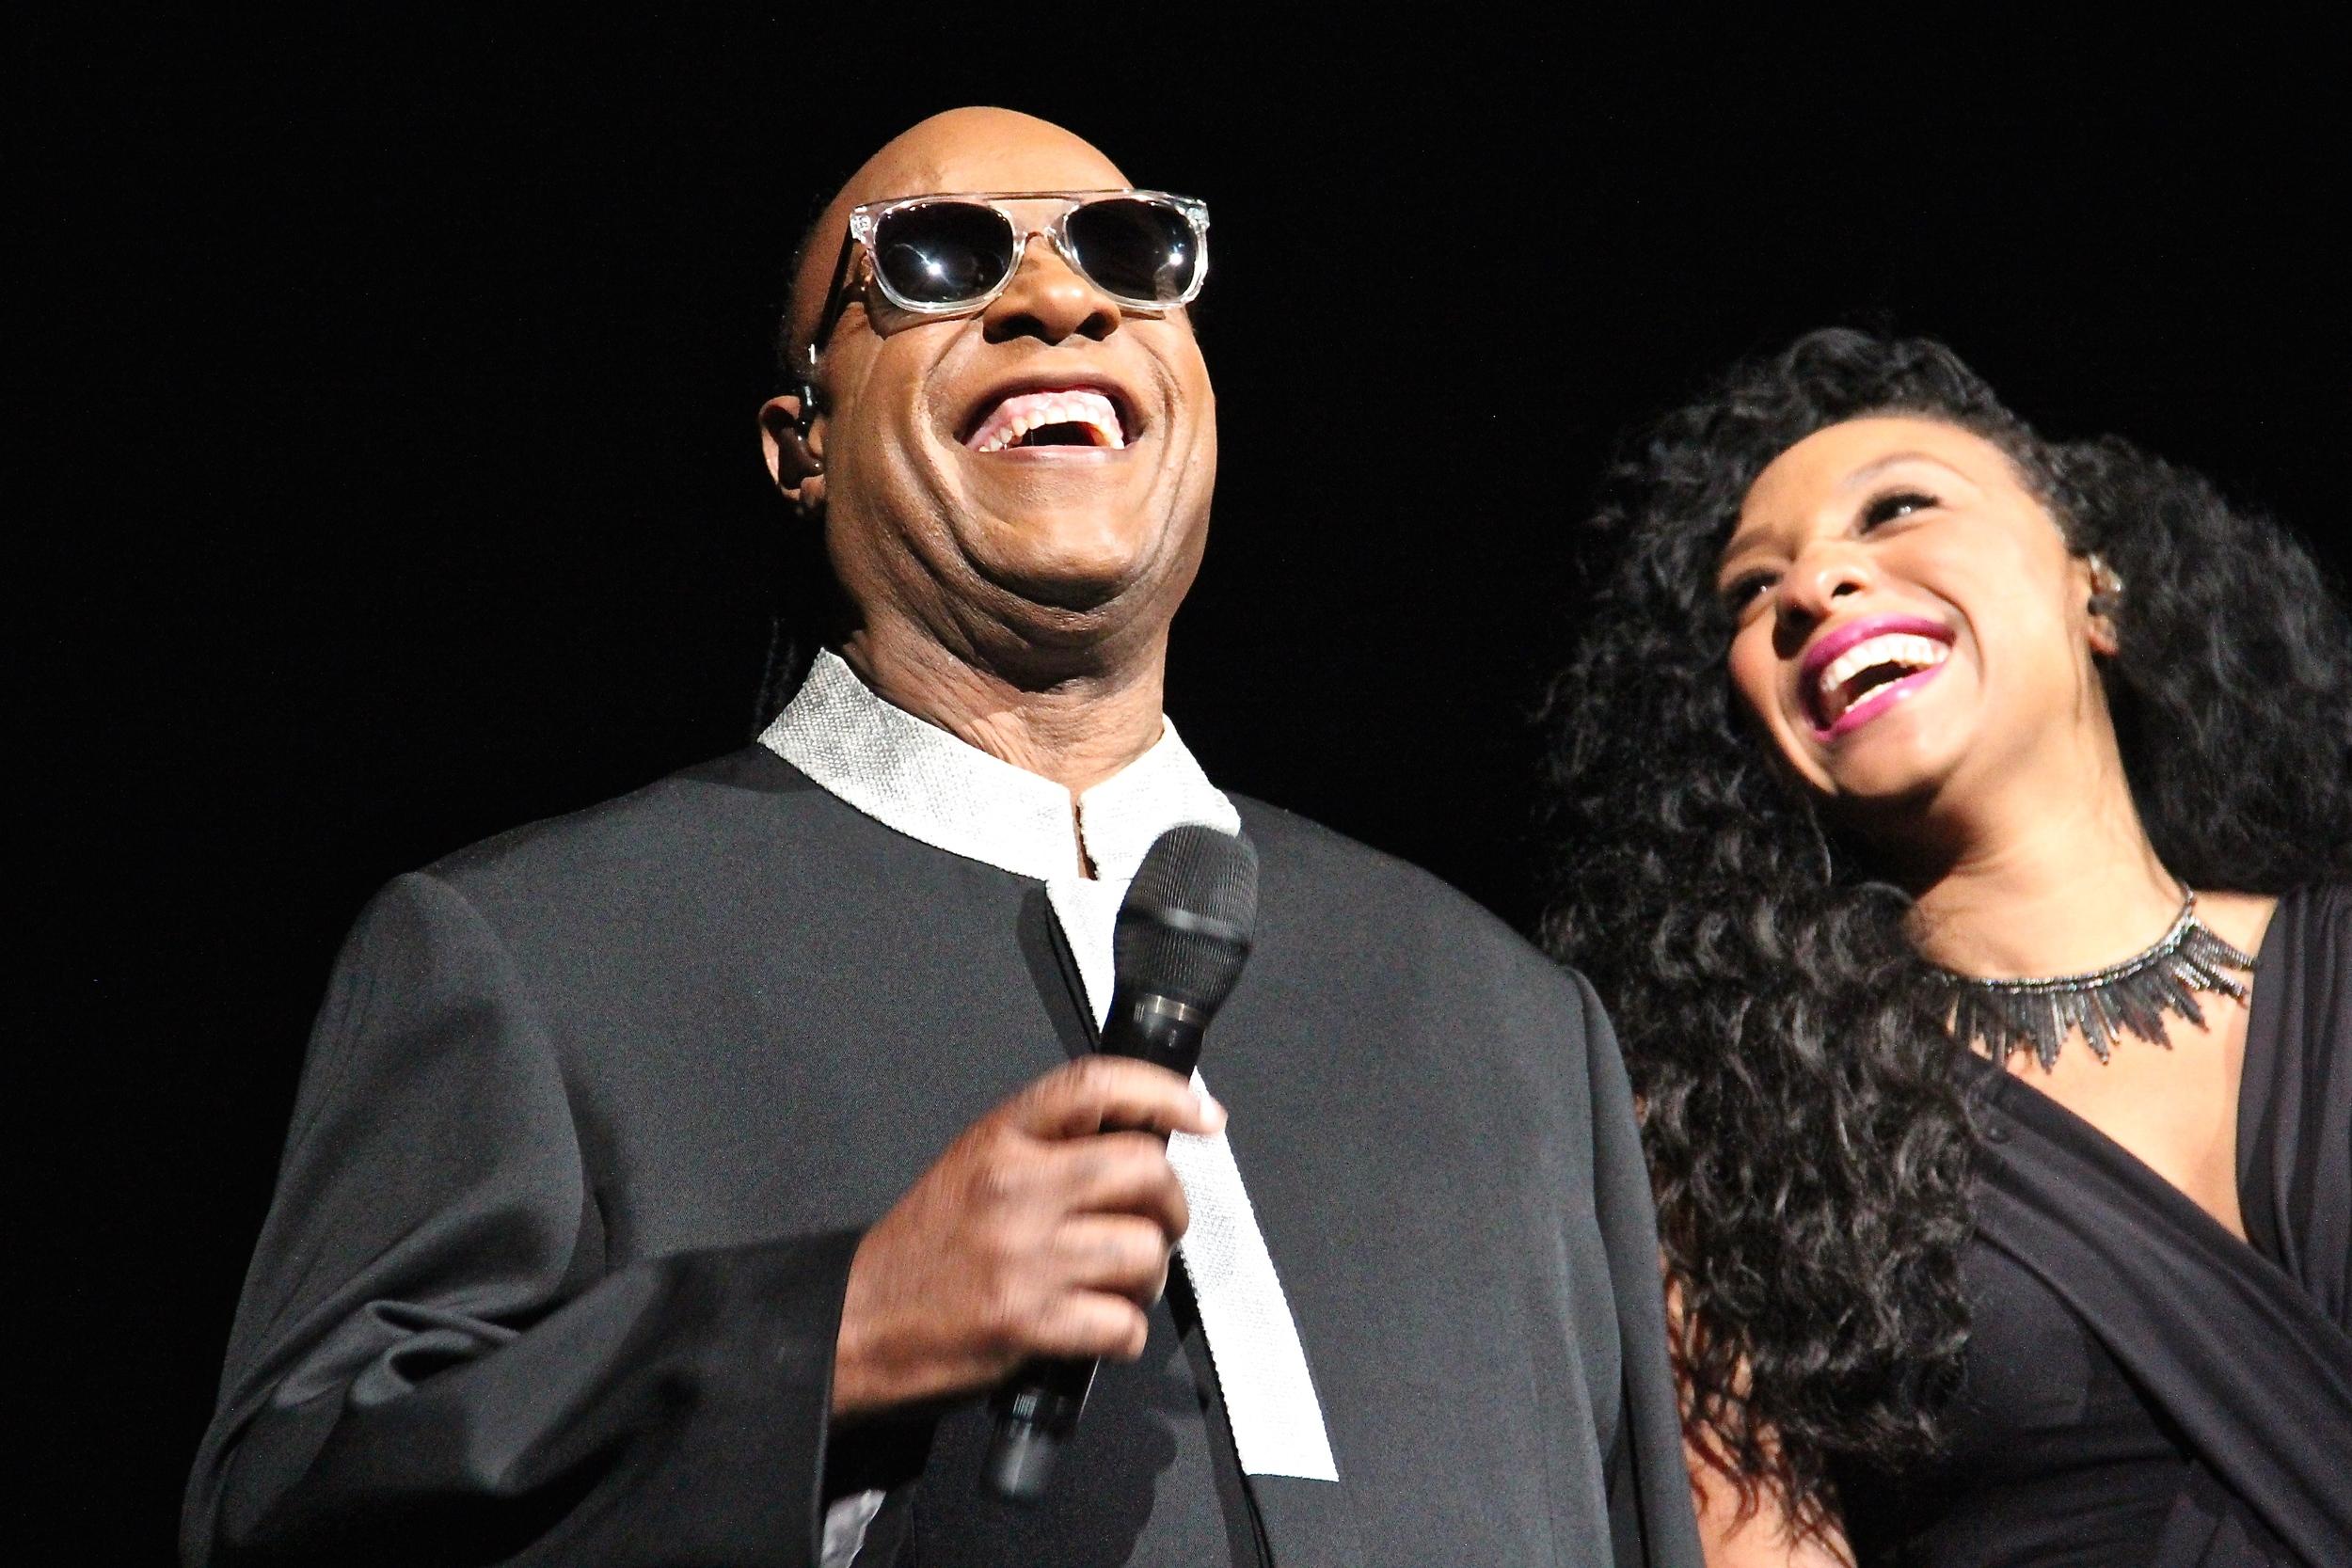 Stevie Wonder at the Sprint Center, 10/23/2015